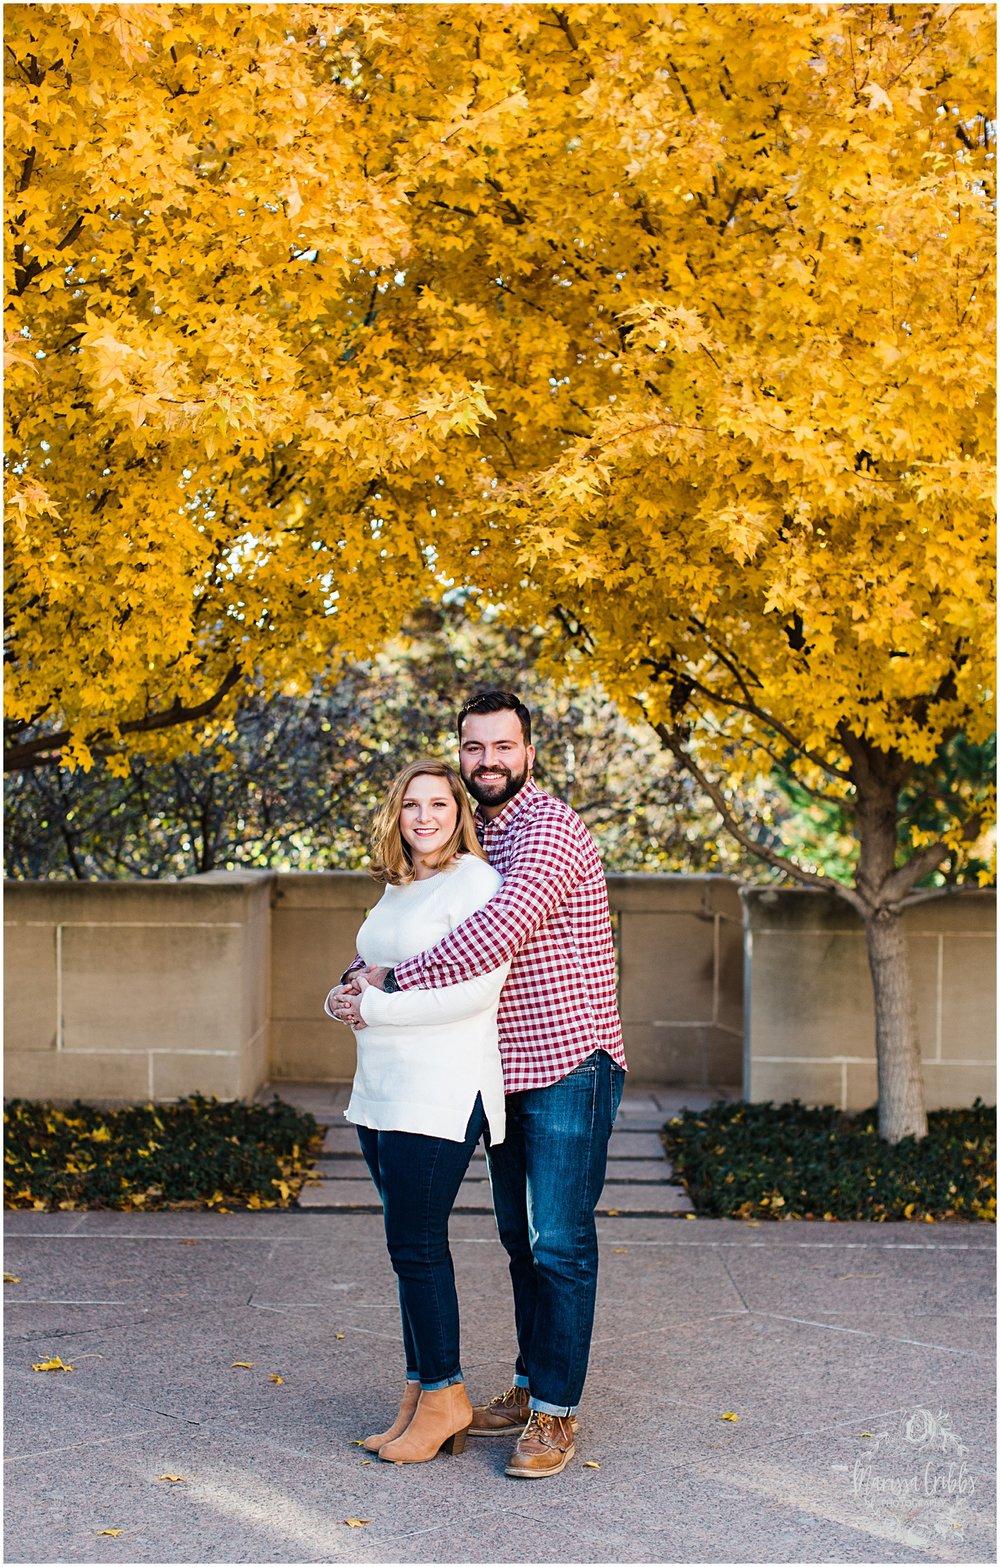 KAM & MARY ENGAGEMENT | MARISSA CRIBBS PHOTOGRAPHY_4022.jpg